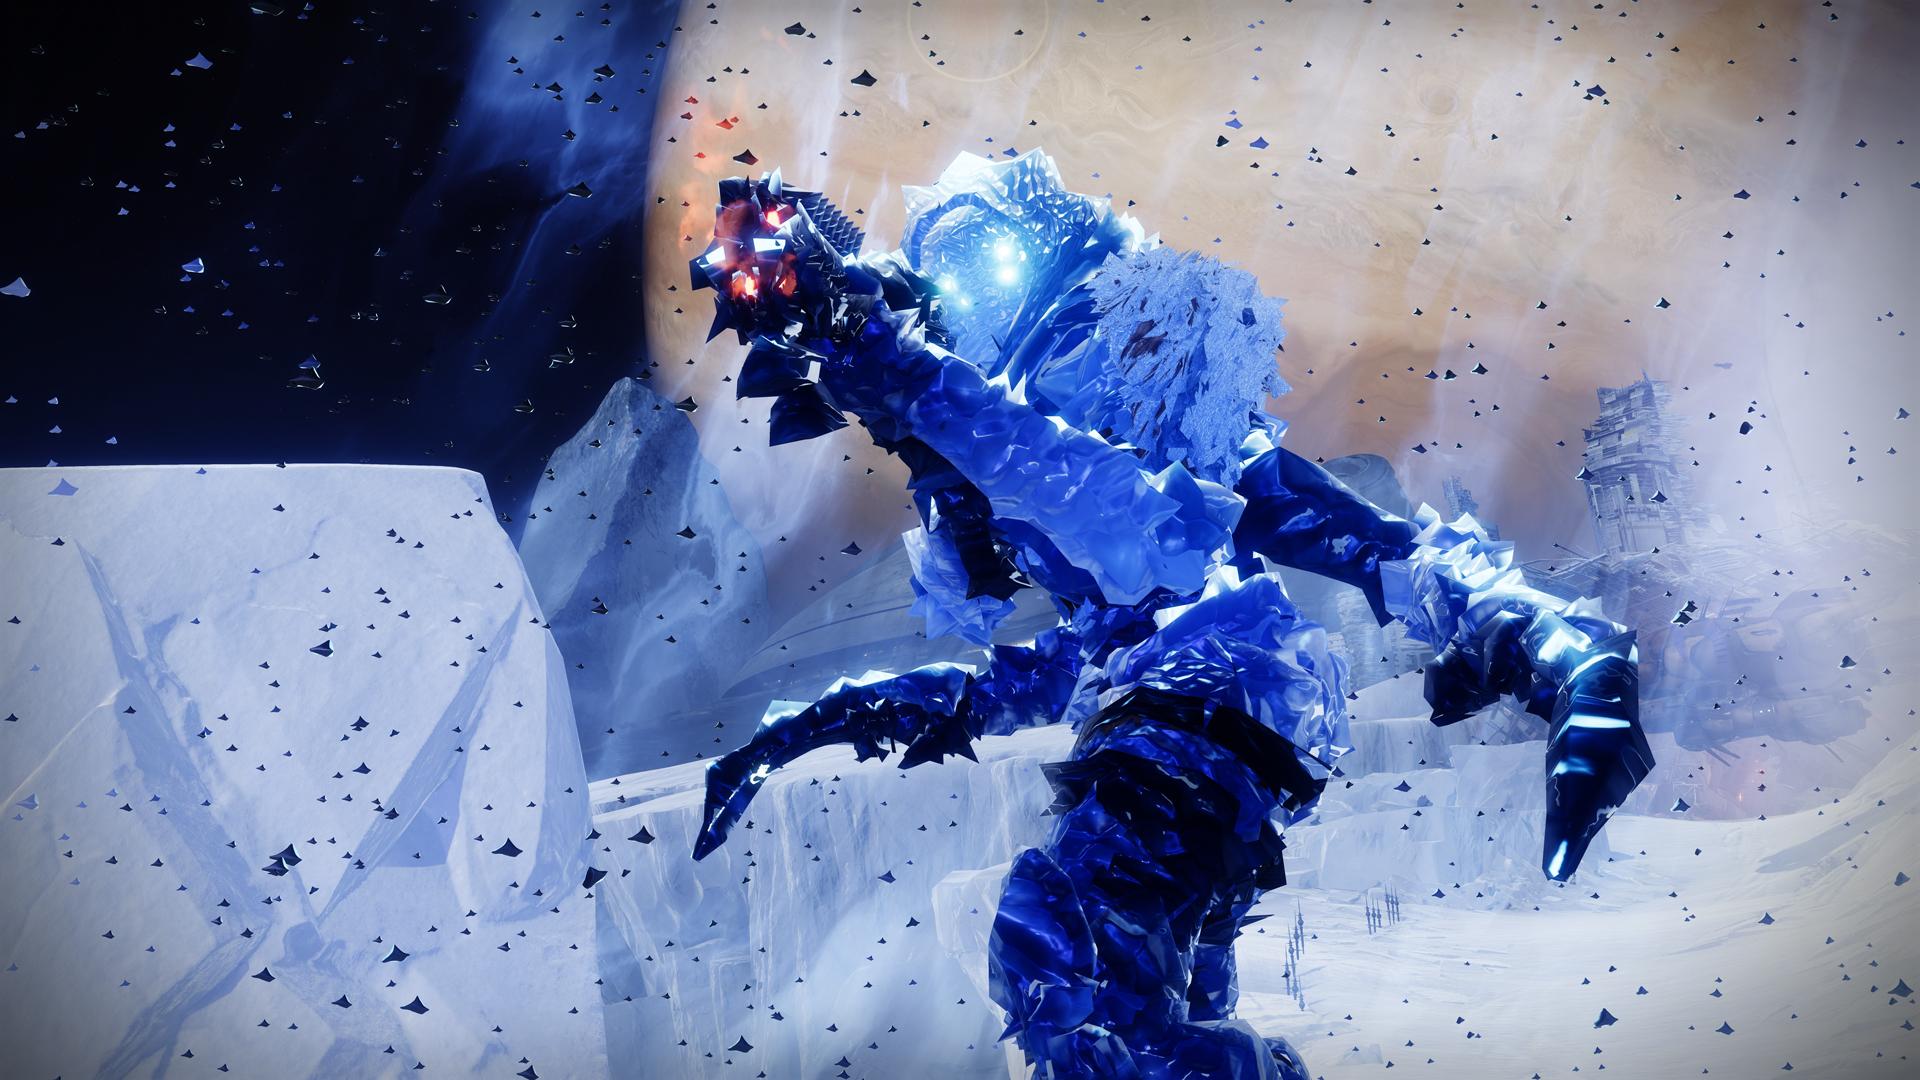 Destiny 2 Beyond Light Key Screen 8